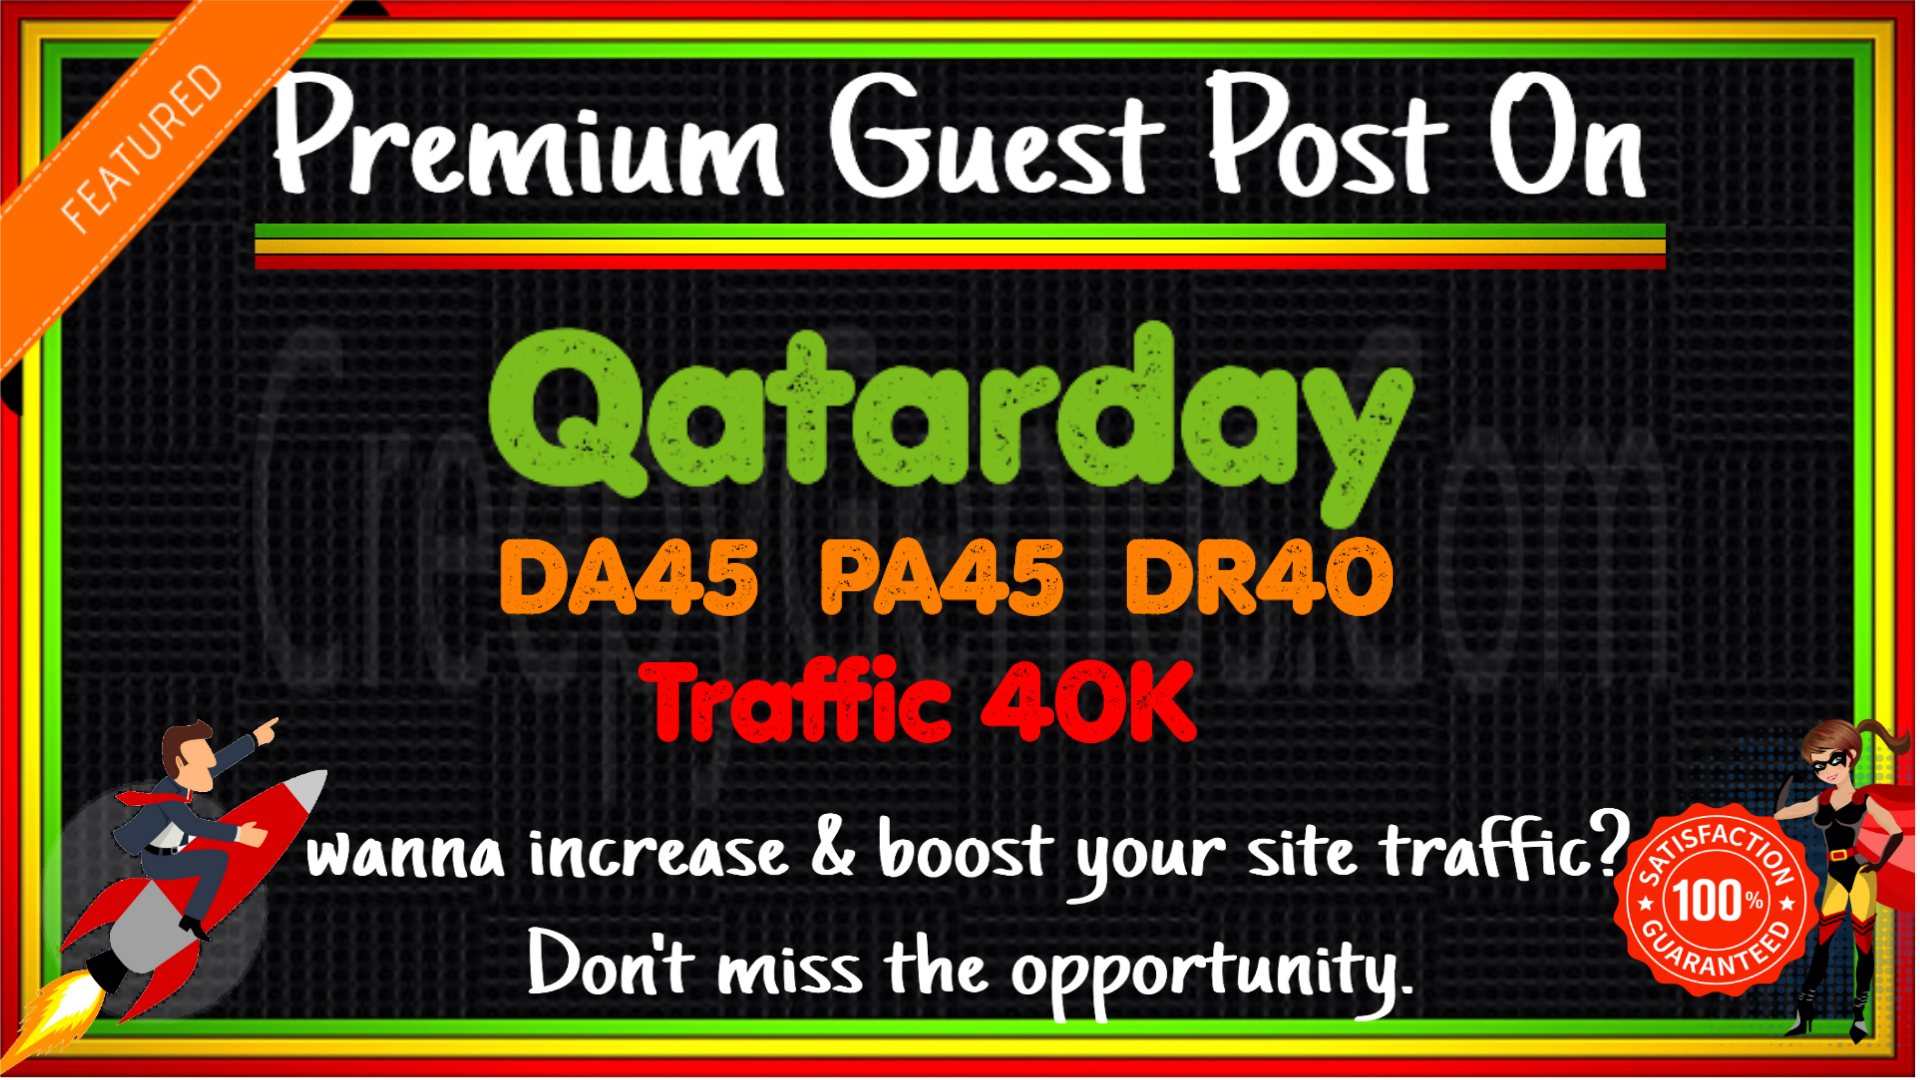 Write & Publish A Guest Post On Qatarday. com DA45 PA45 DR43